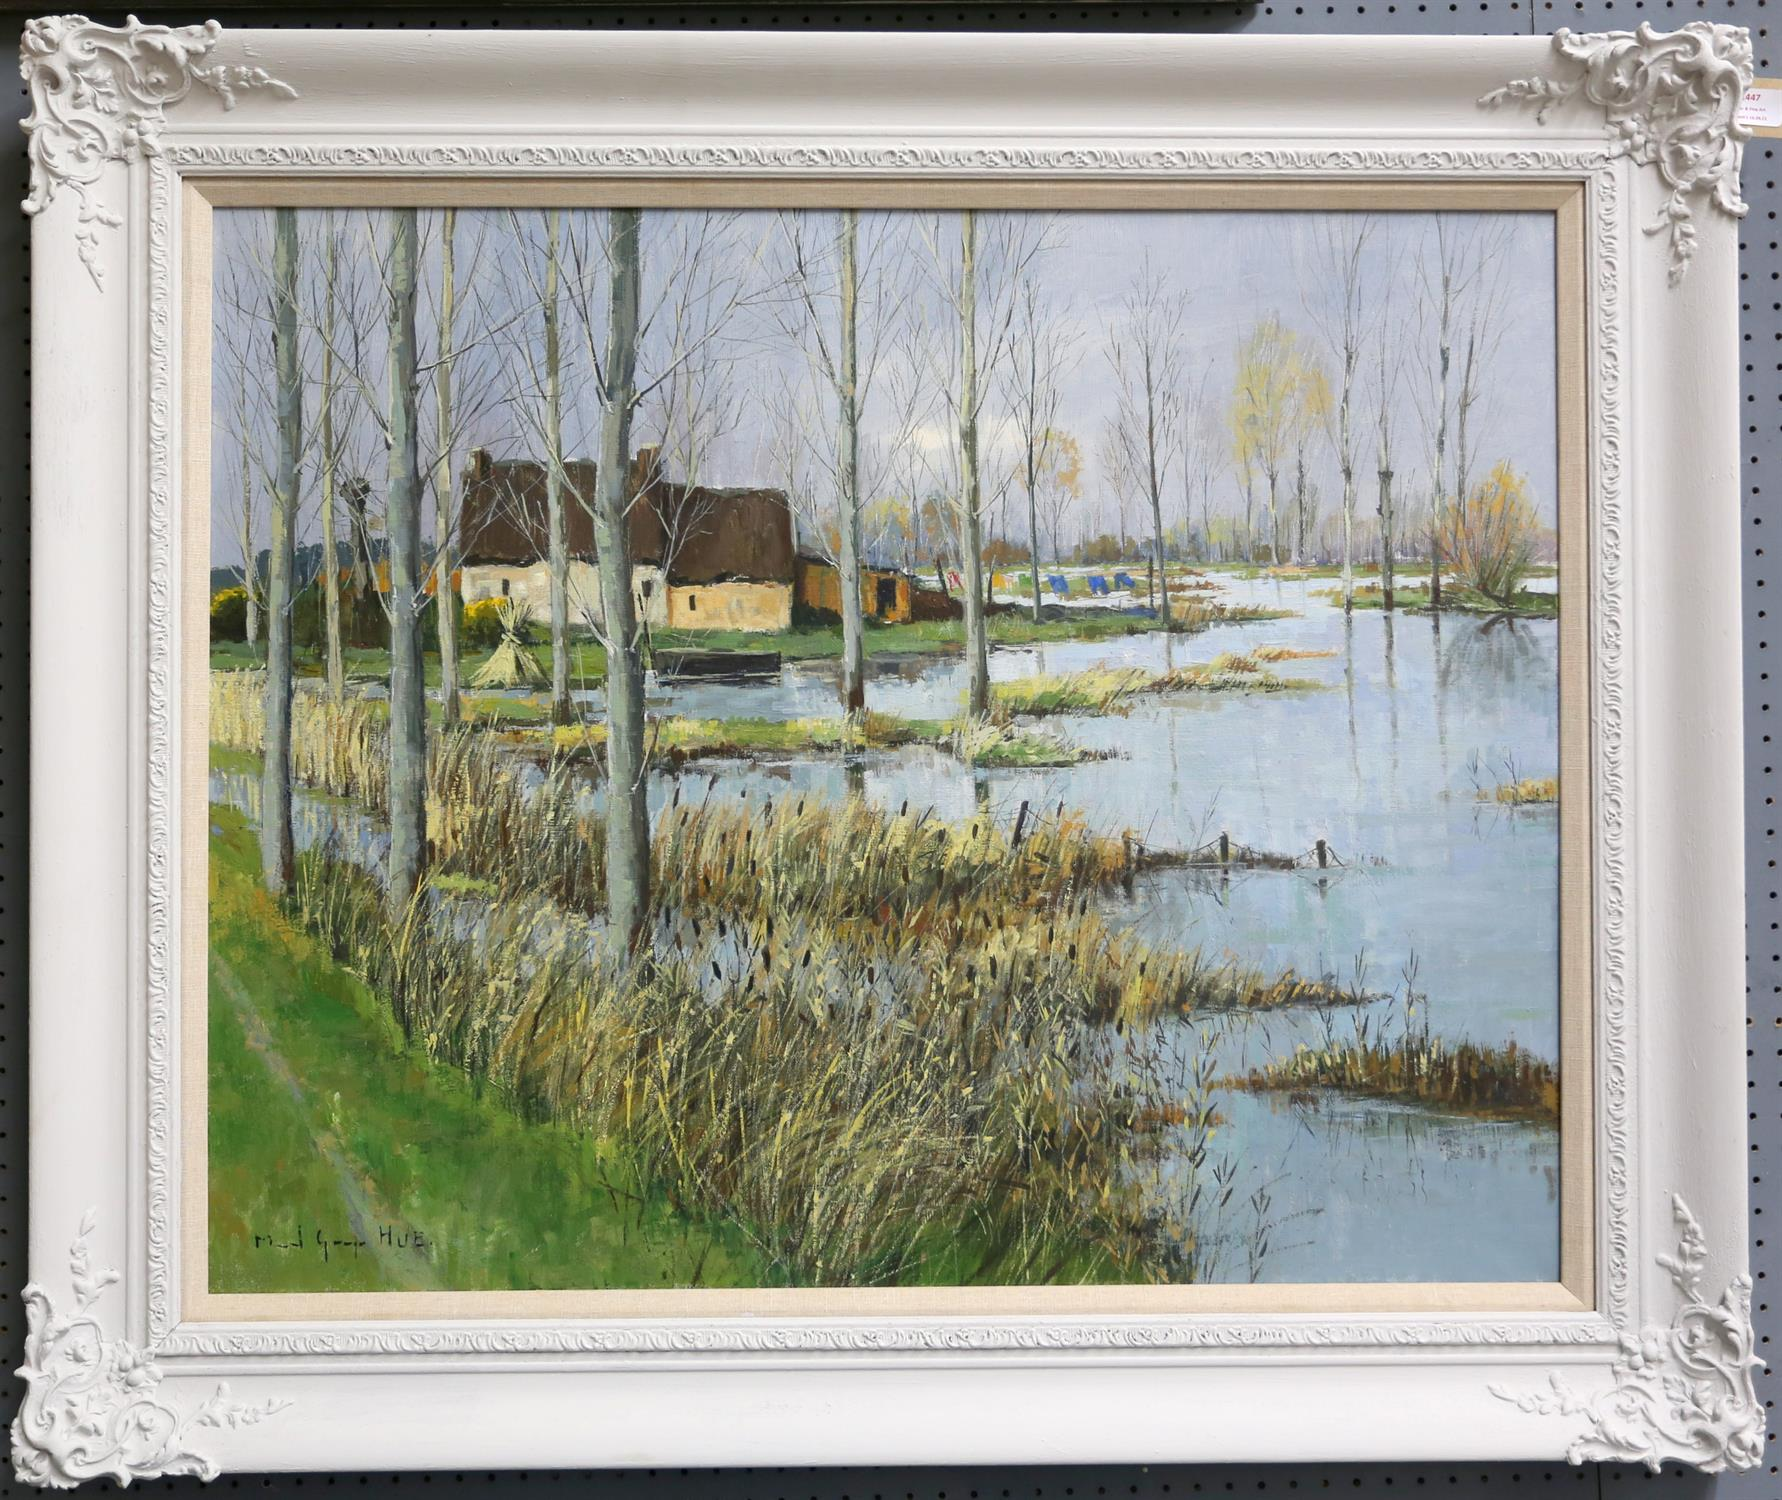 Marcel Georges Hue (b. 1907). 'Les Paysage en Briere', lakeside landscape. Oil on canvas, - Image 2 of 3